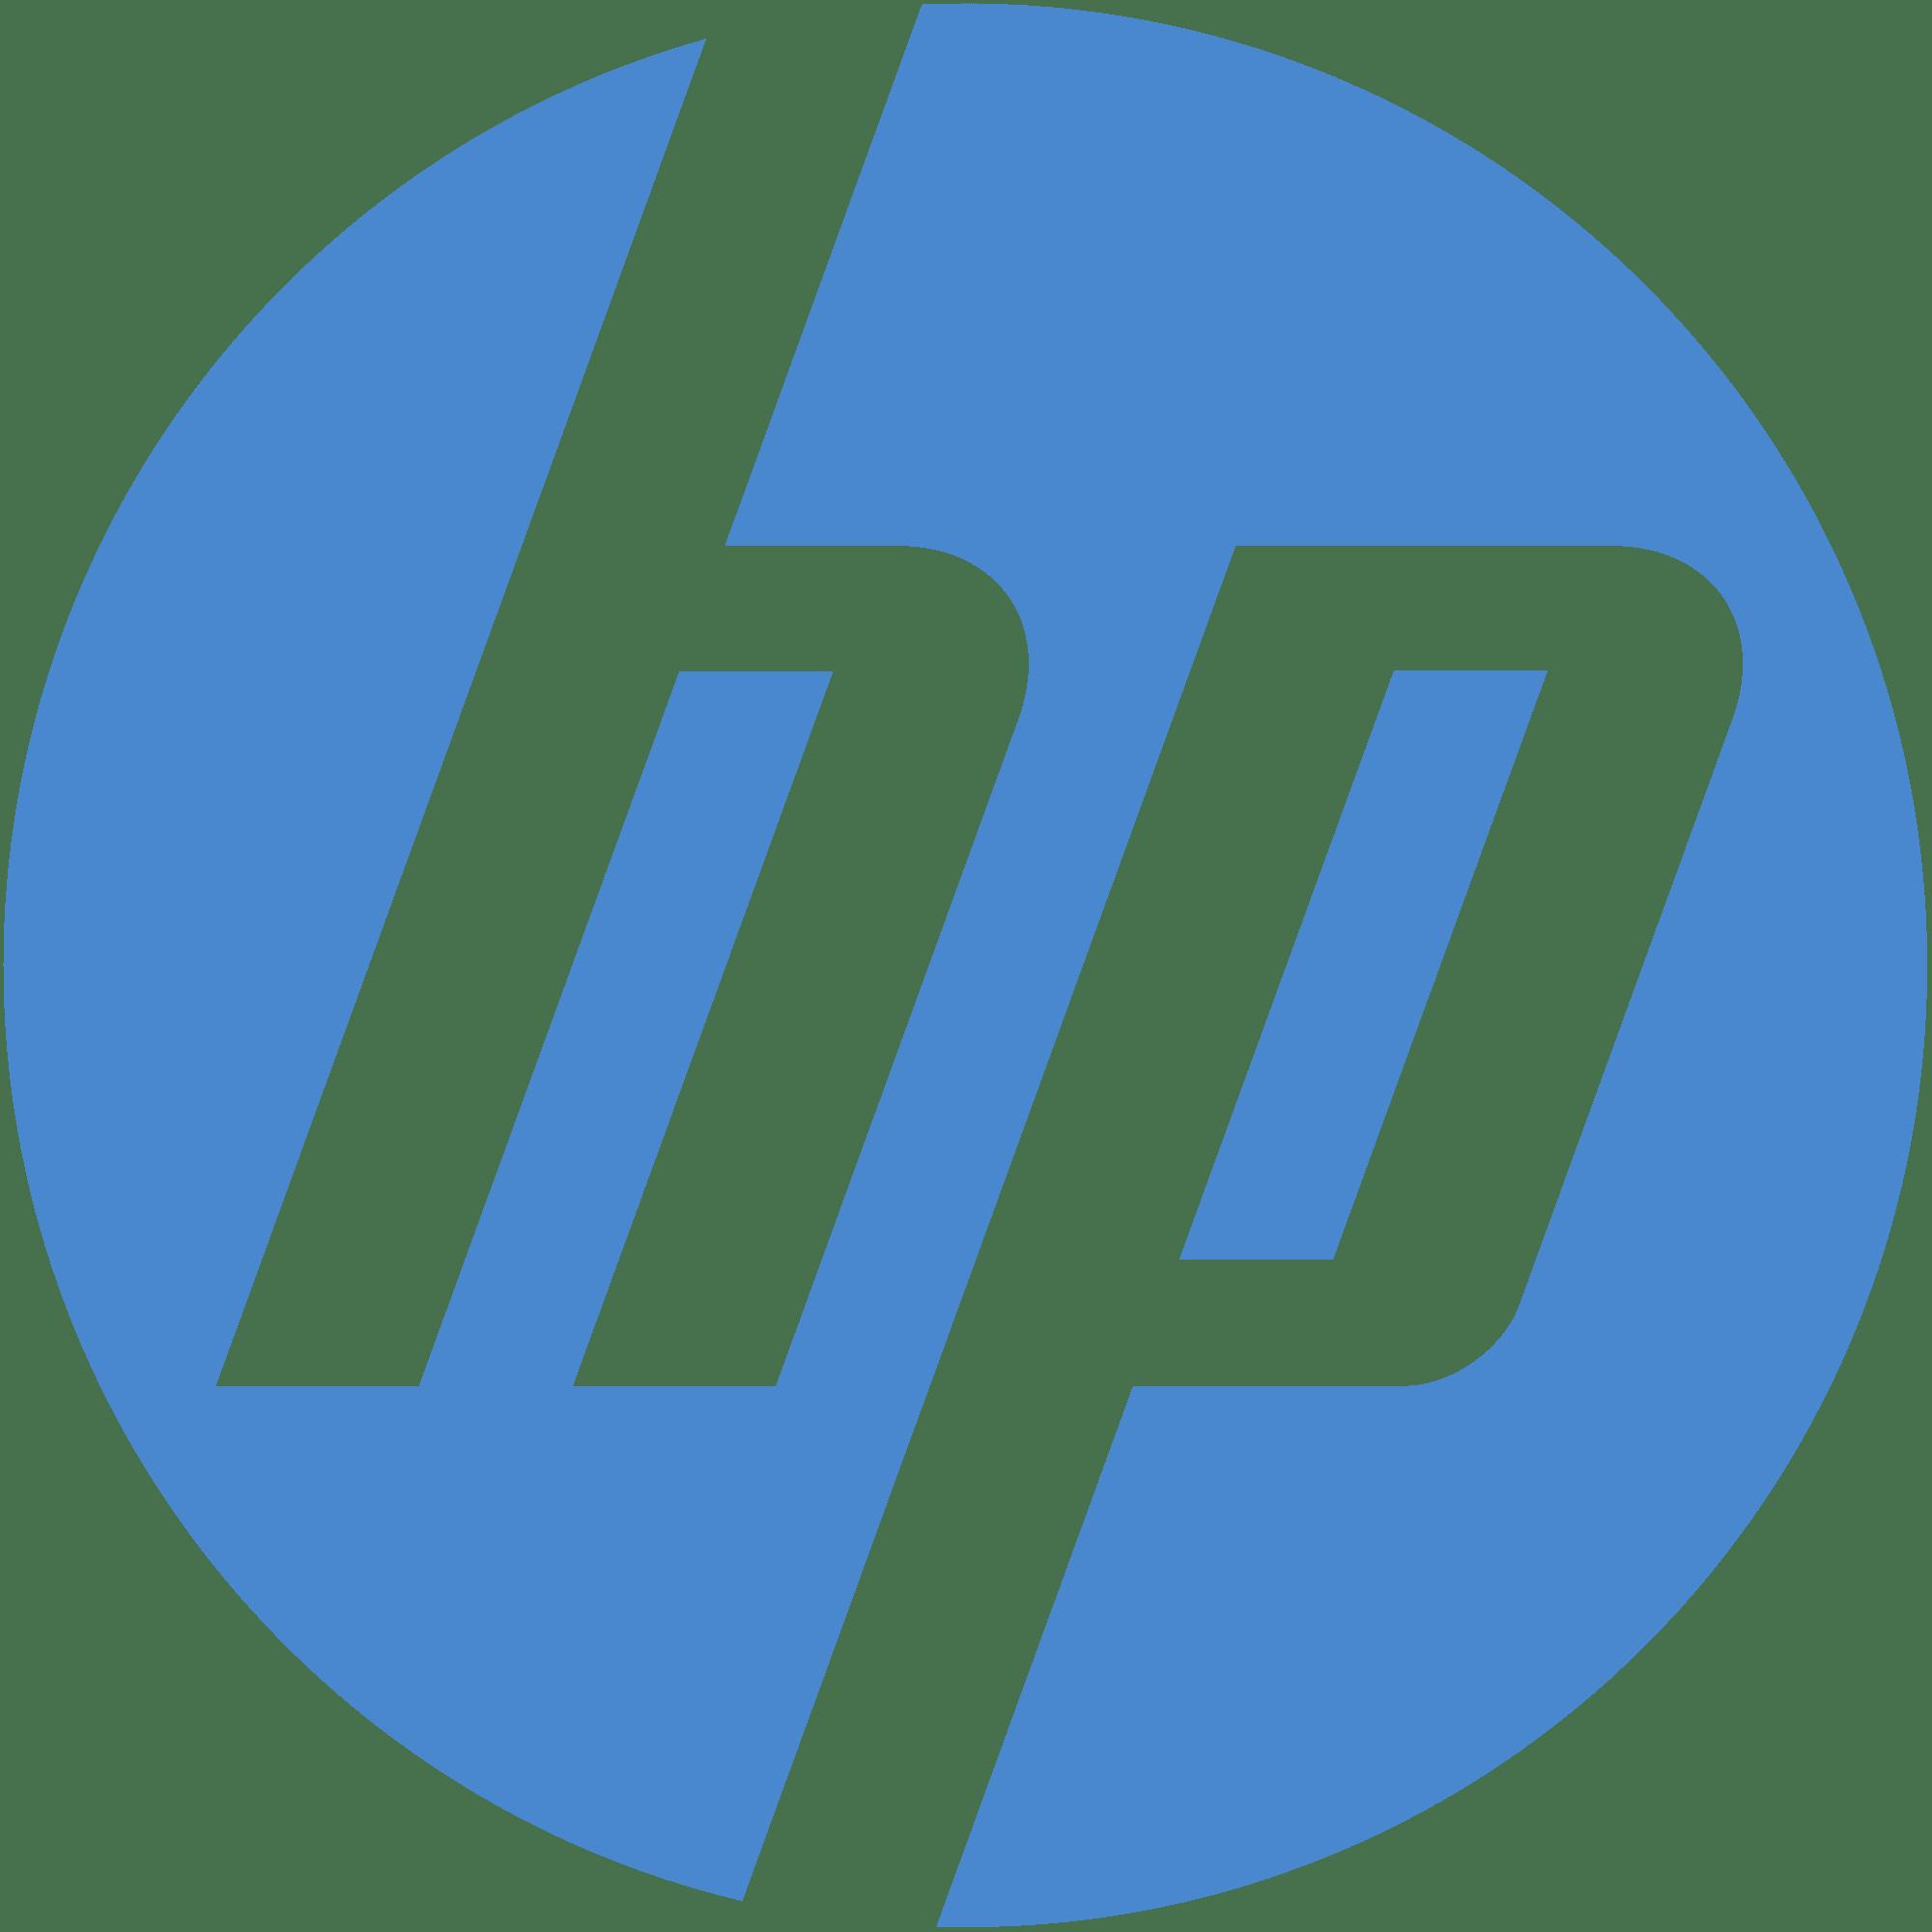 HP Pavilion g4-1314tx Notebook PC drivers